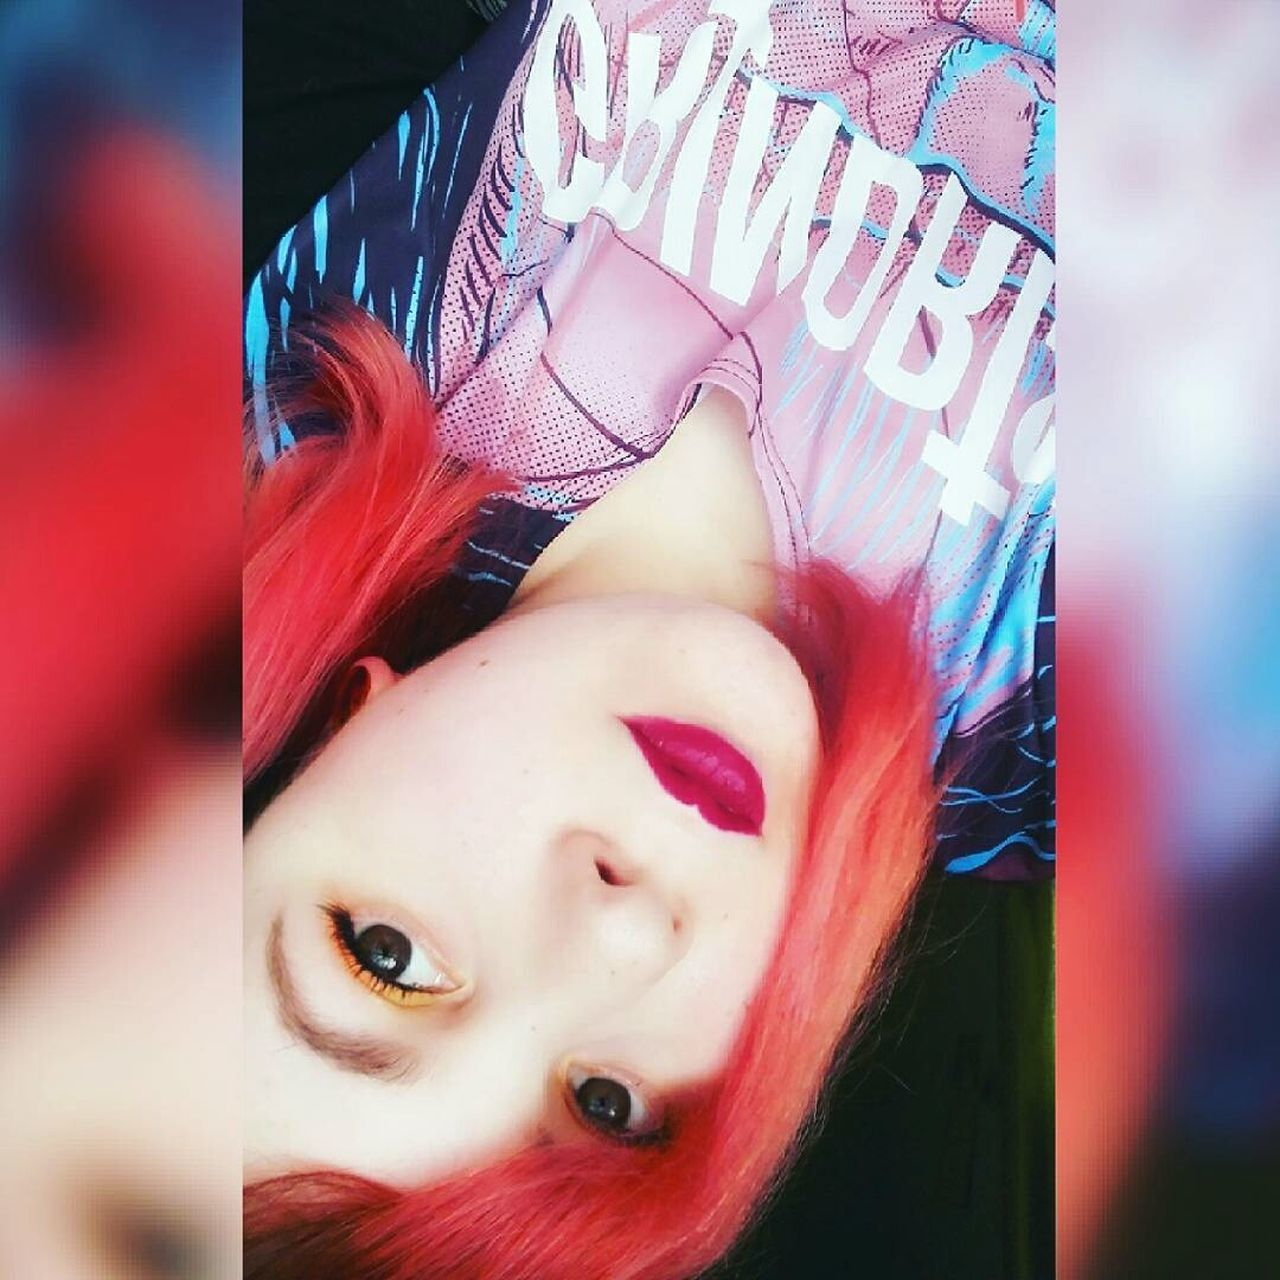 Me Itsme ThatsMe Redhair Redhead Lips Lipstick Picoftheday Photooftheday Like4like Selfie ✌ Selfies Self Portrait Selfie Portrait Portrait Girl Woman Plug Plugs Alternativegirl Shorthair Coloredhair Makeup Eyes People